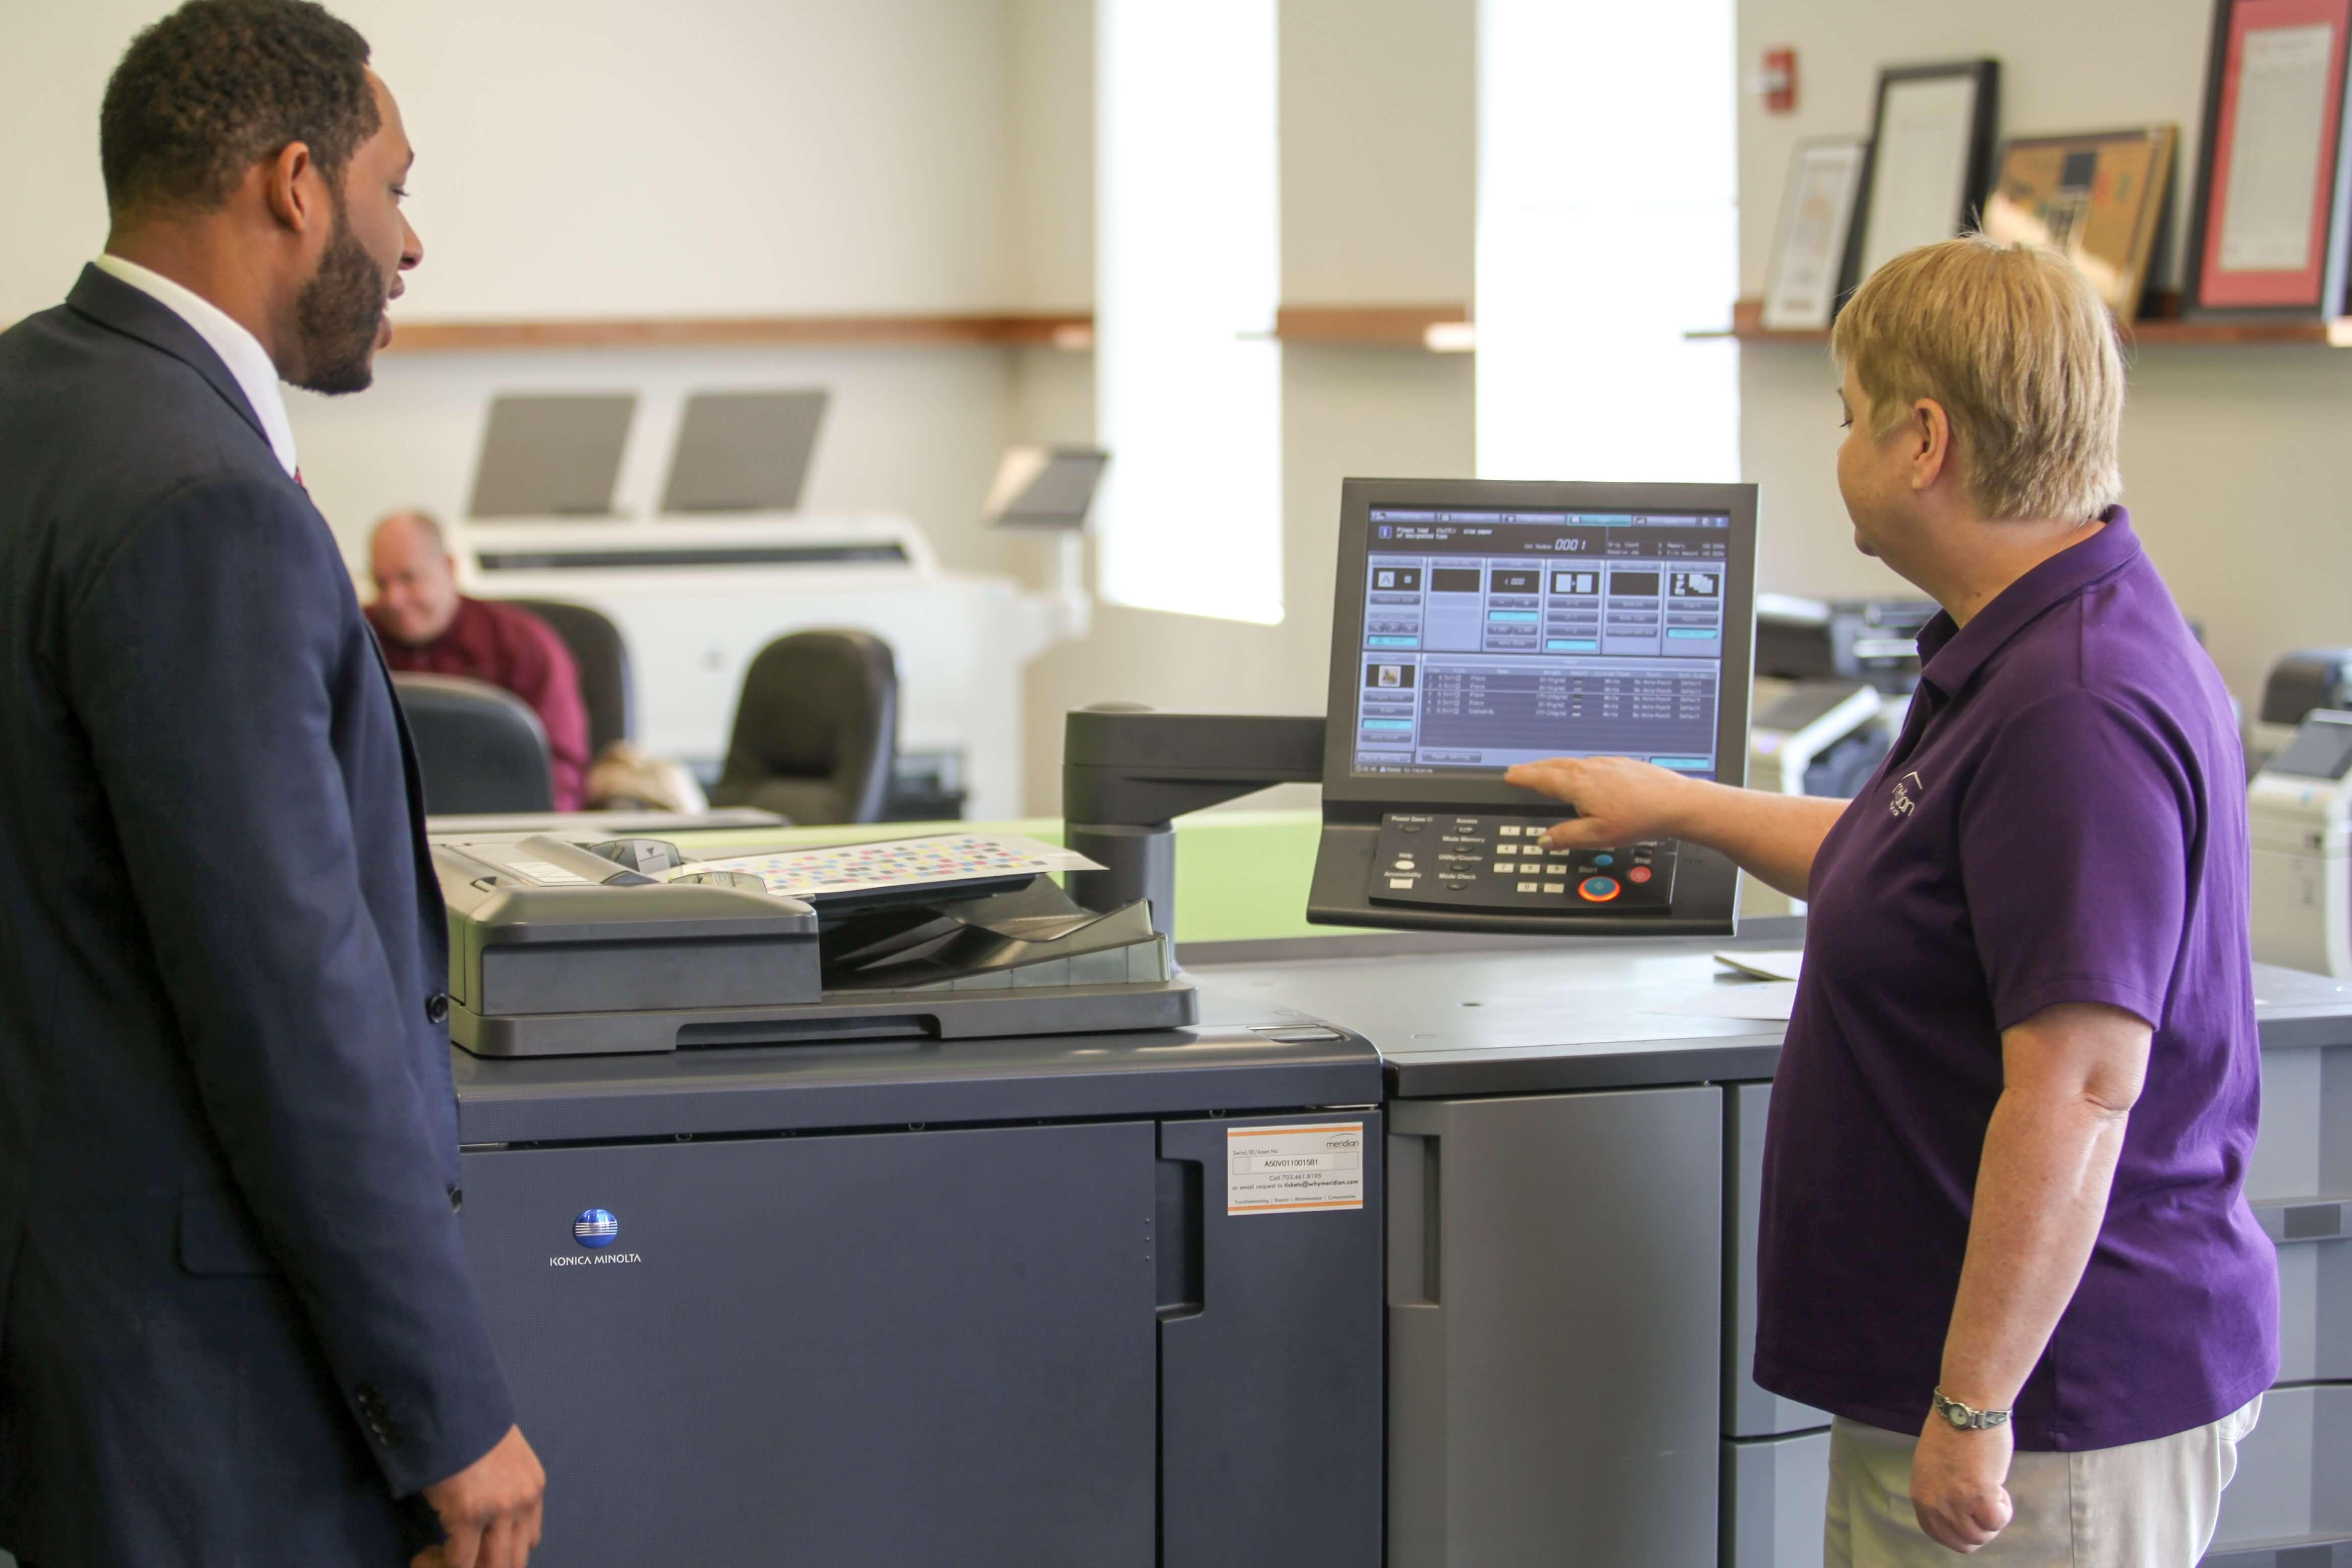 meridian-employees-beth-jason-interacting-with-konica-minolta-production-printer-copier.jpg